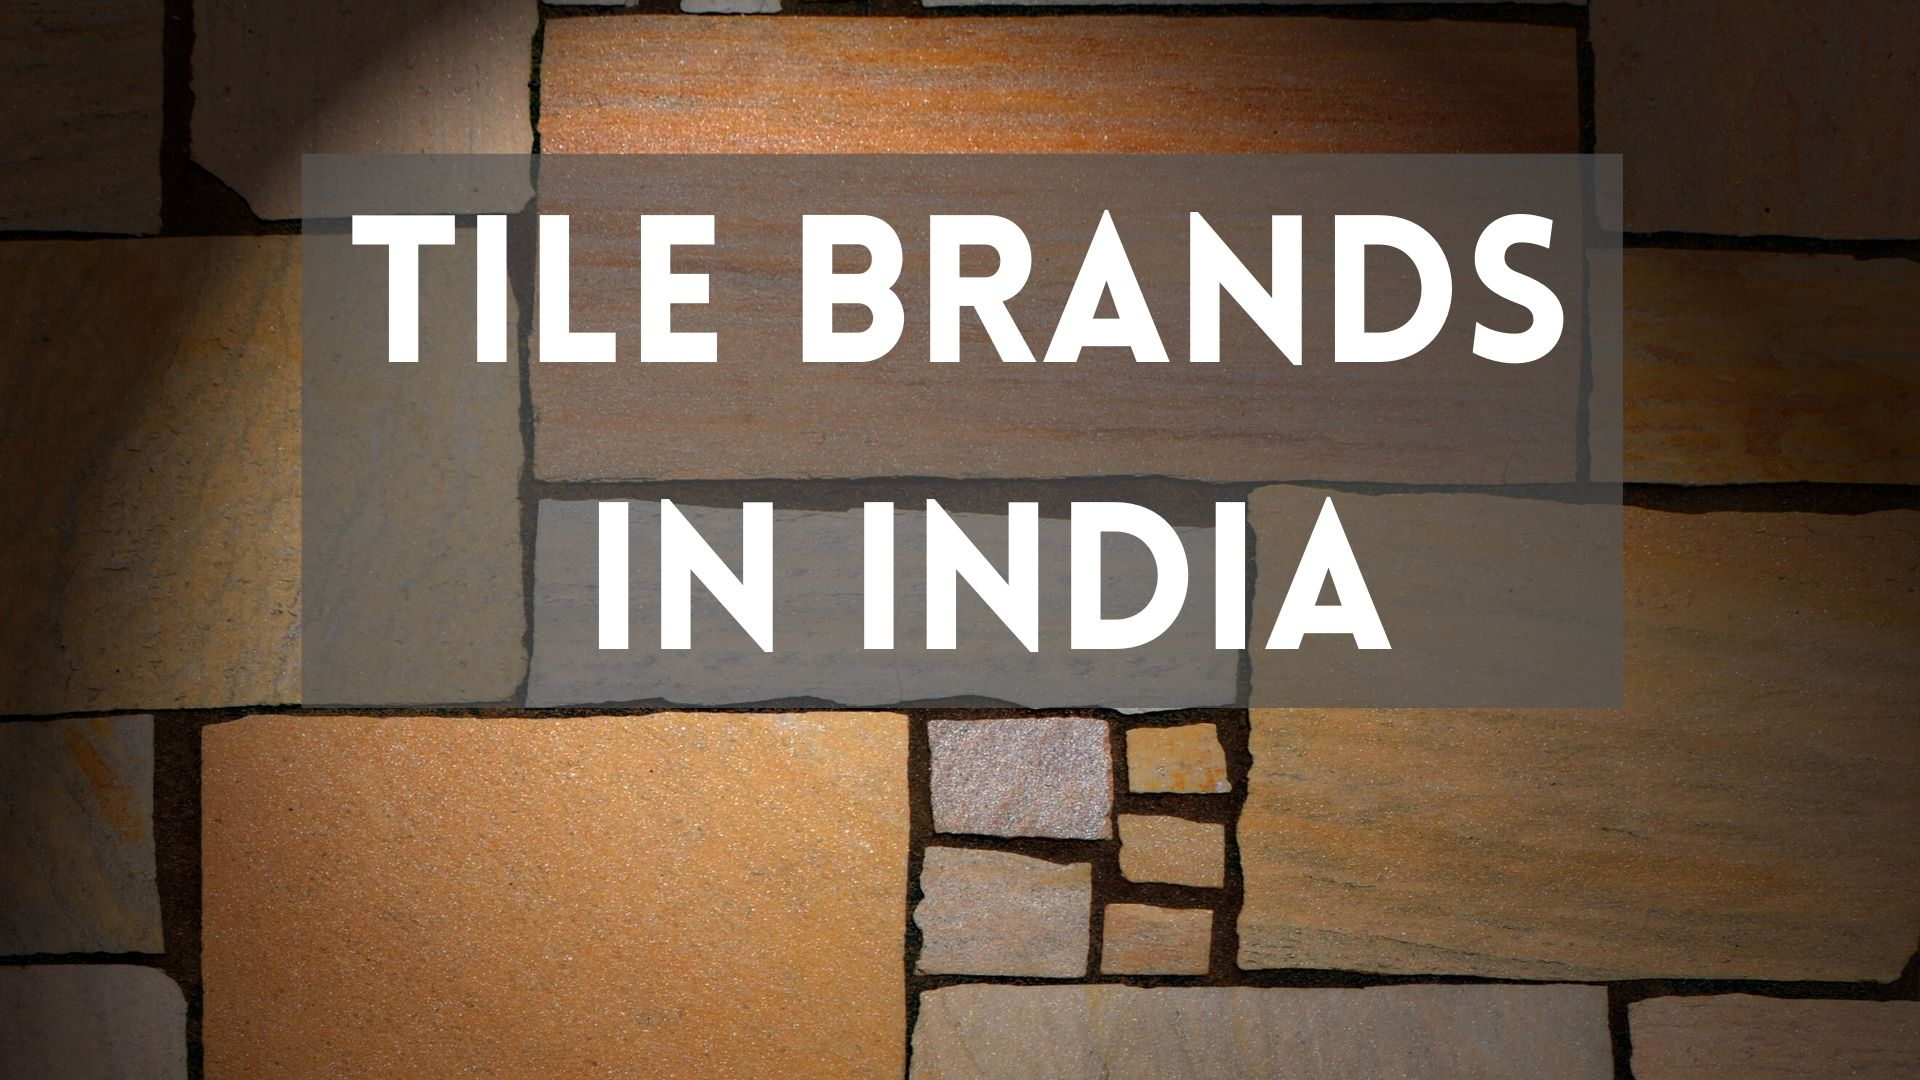 Top 10 Best Tile Companies Tile Brands In India 2020